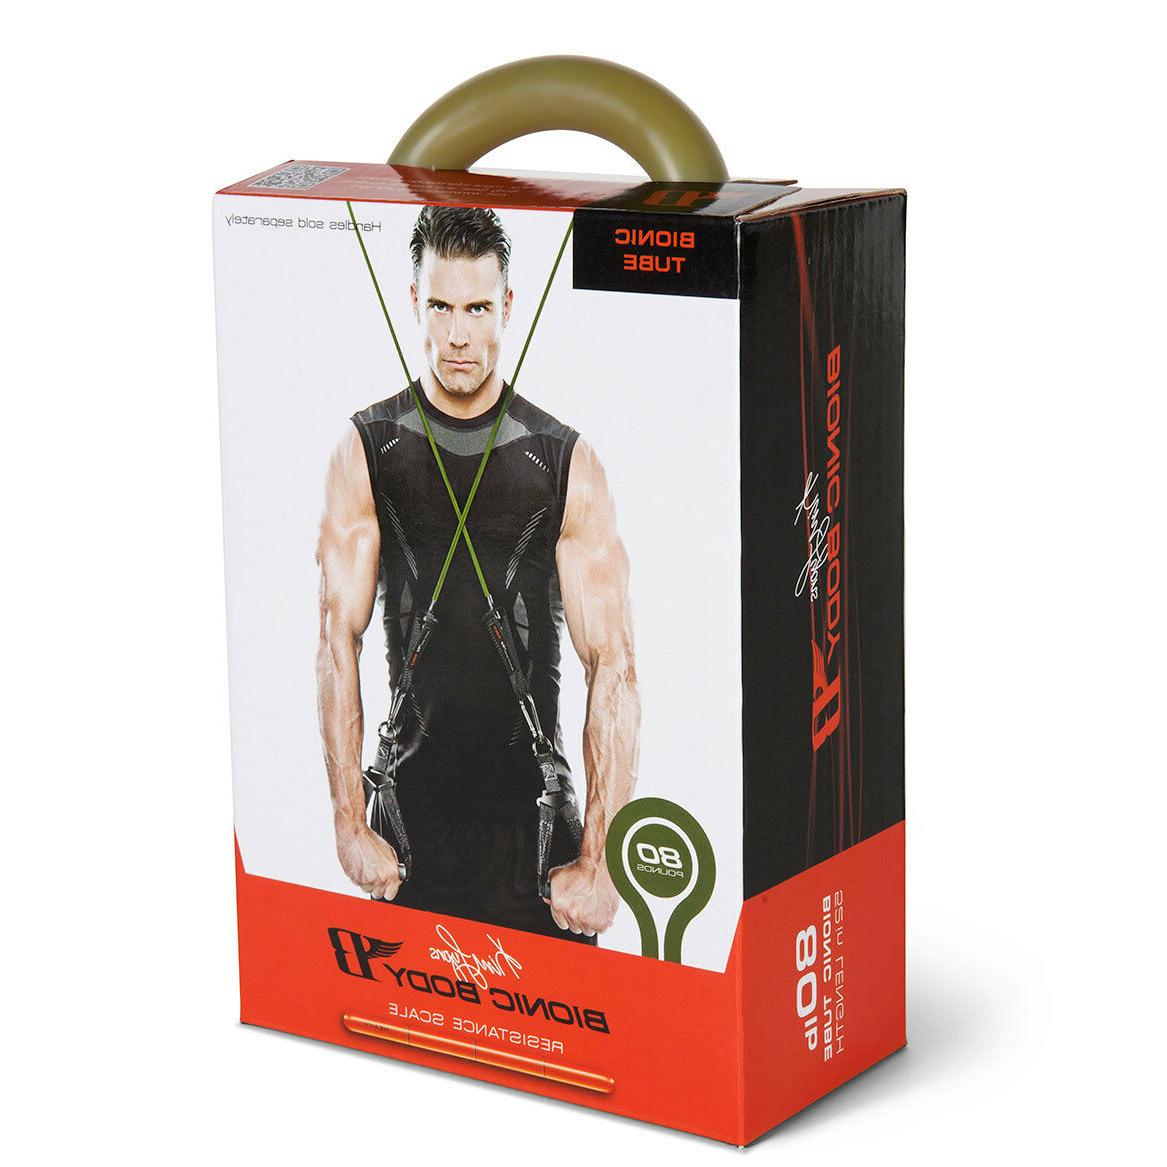 Bionic Body 80 LB Weight Tube BBRT-0080 Portable Fitness